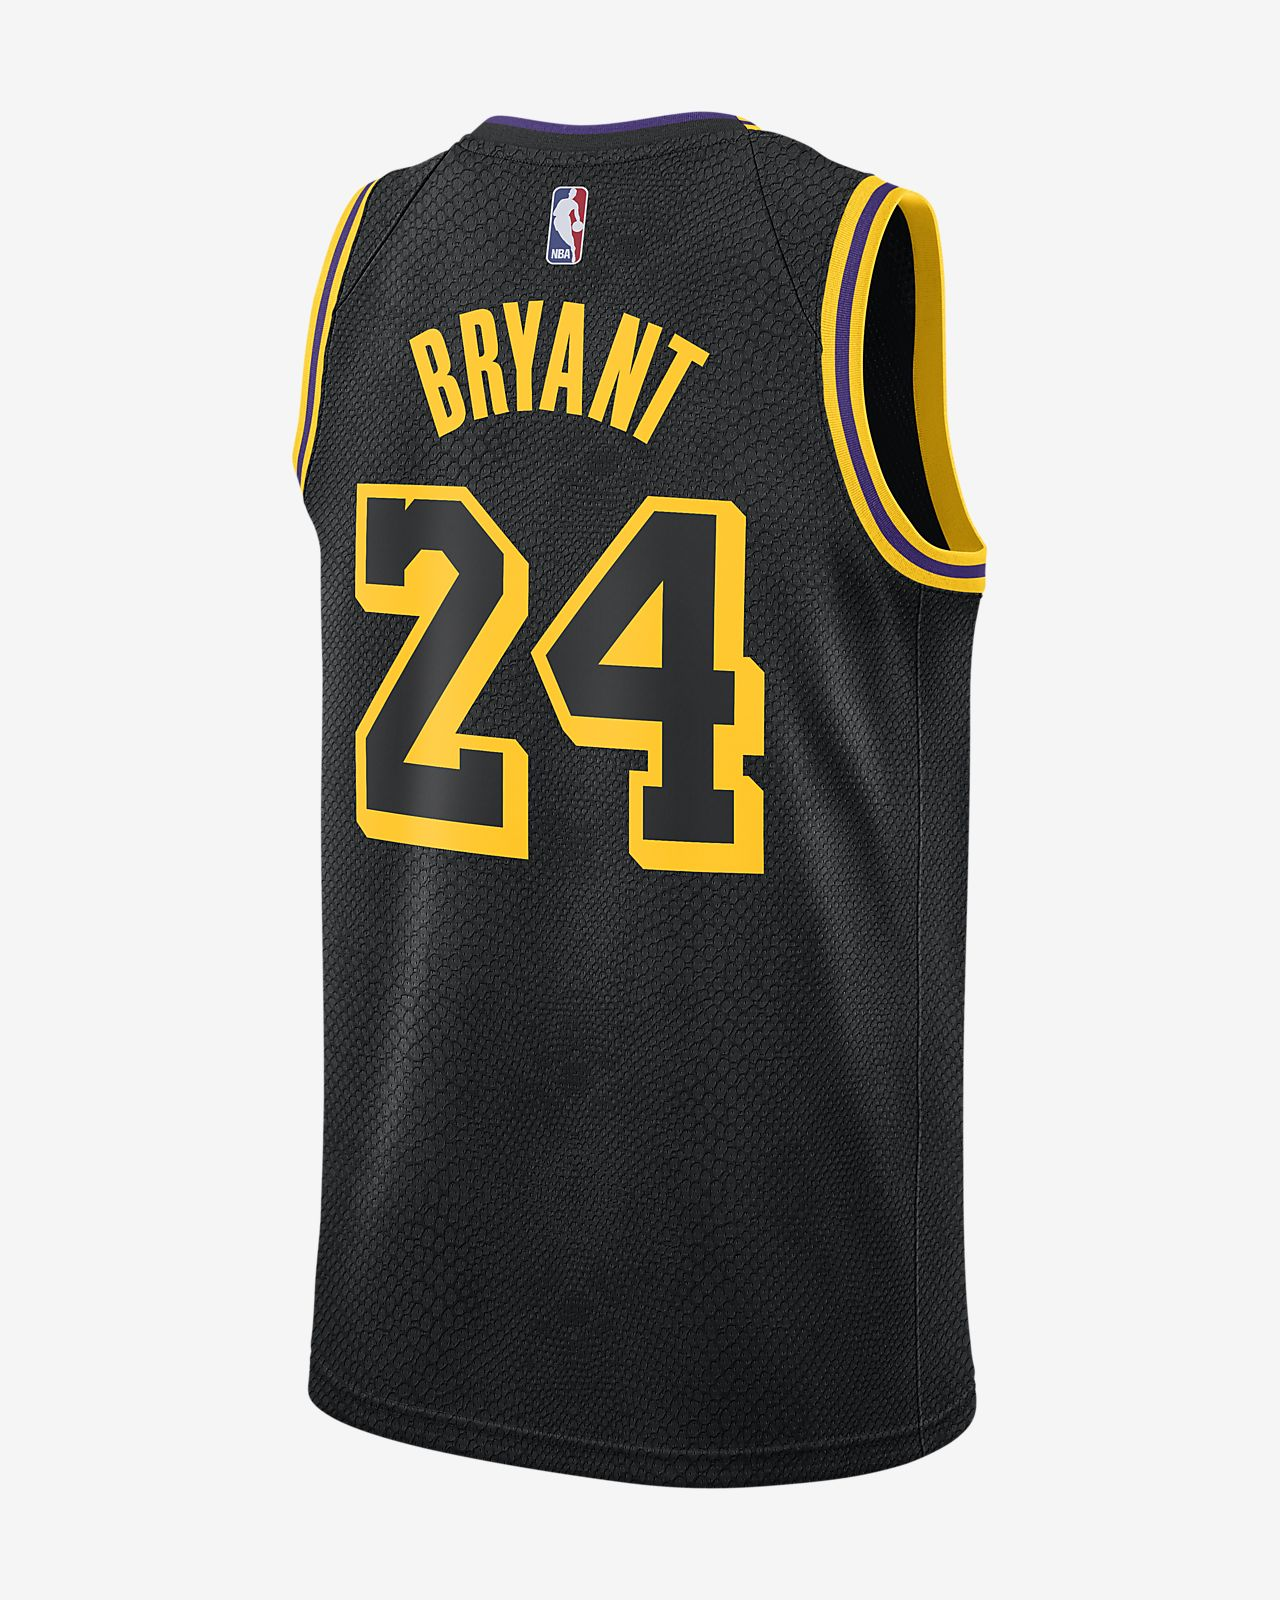 Kobe Bryant Backpacks >> Kobe Bryant City Edition Swingman Jersey (Los Angeles Lakers) Men's Nike NBA Jersey. Nike.com ID